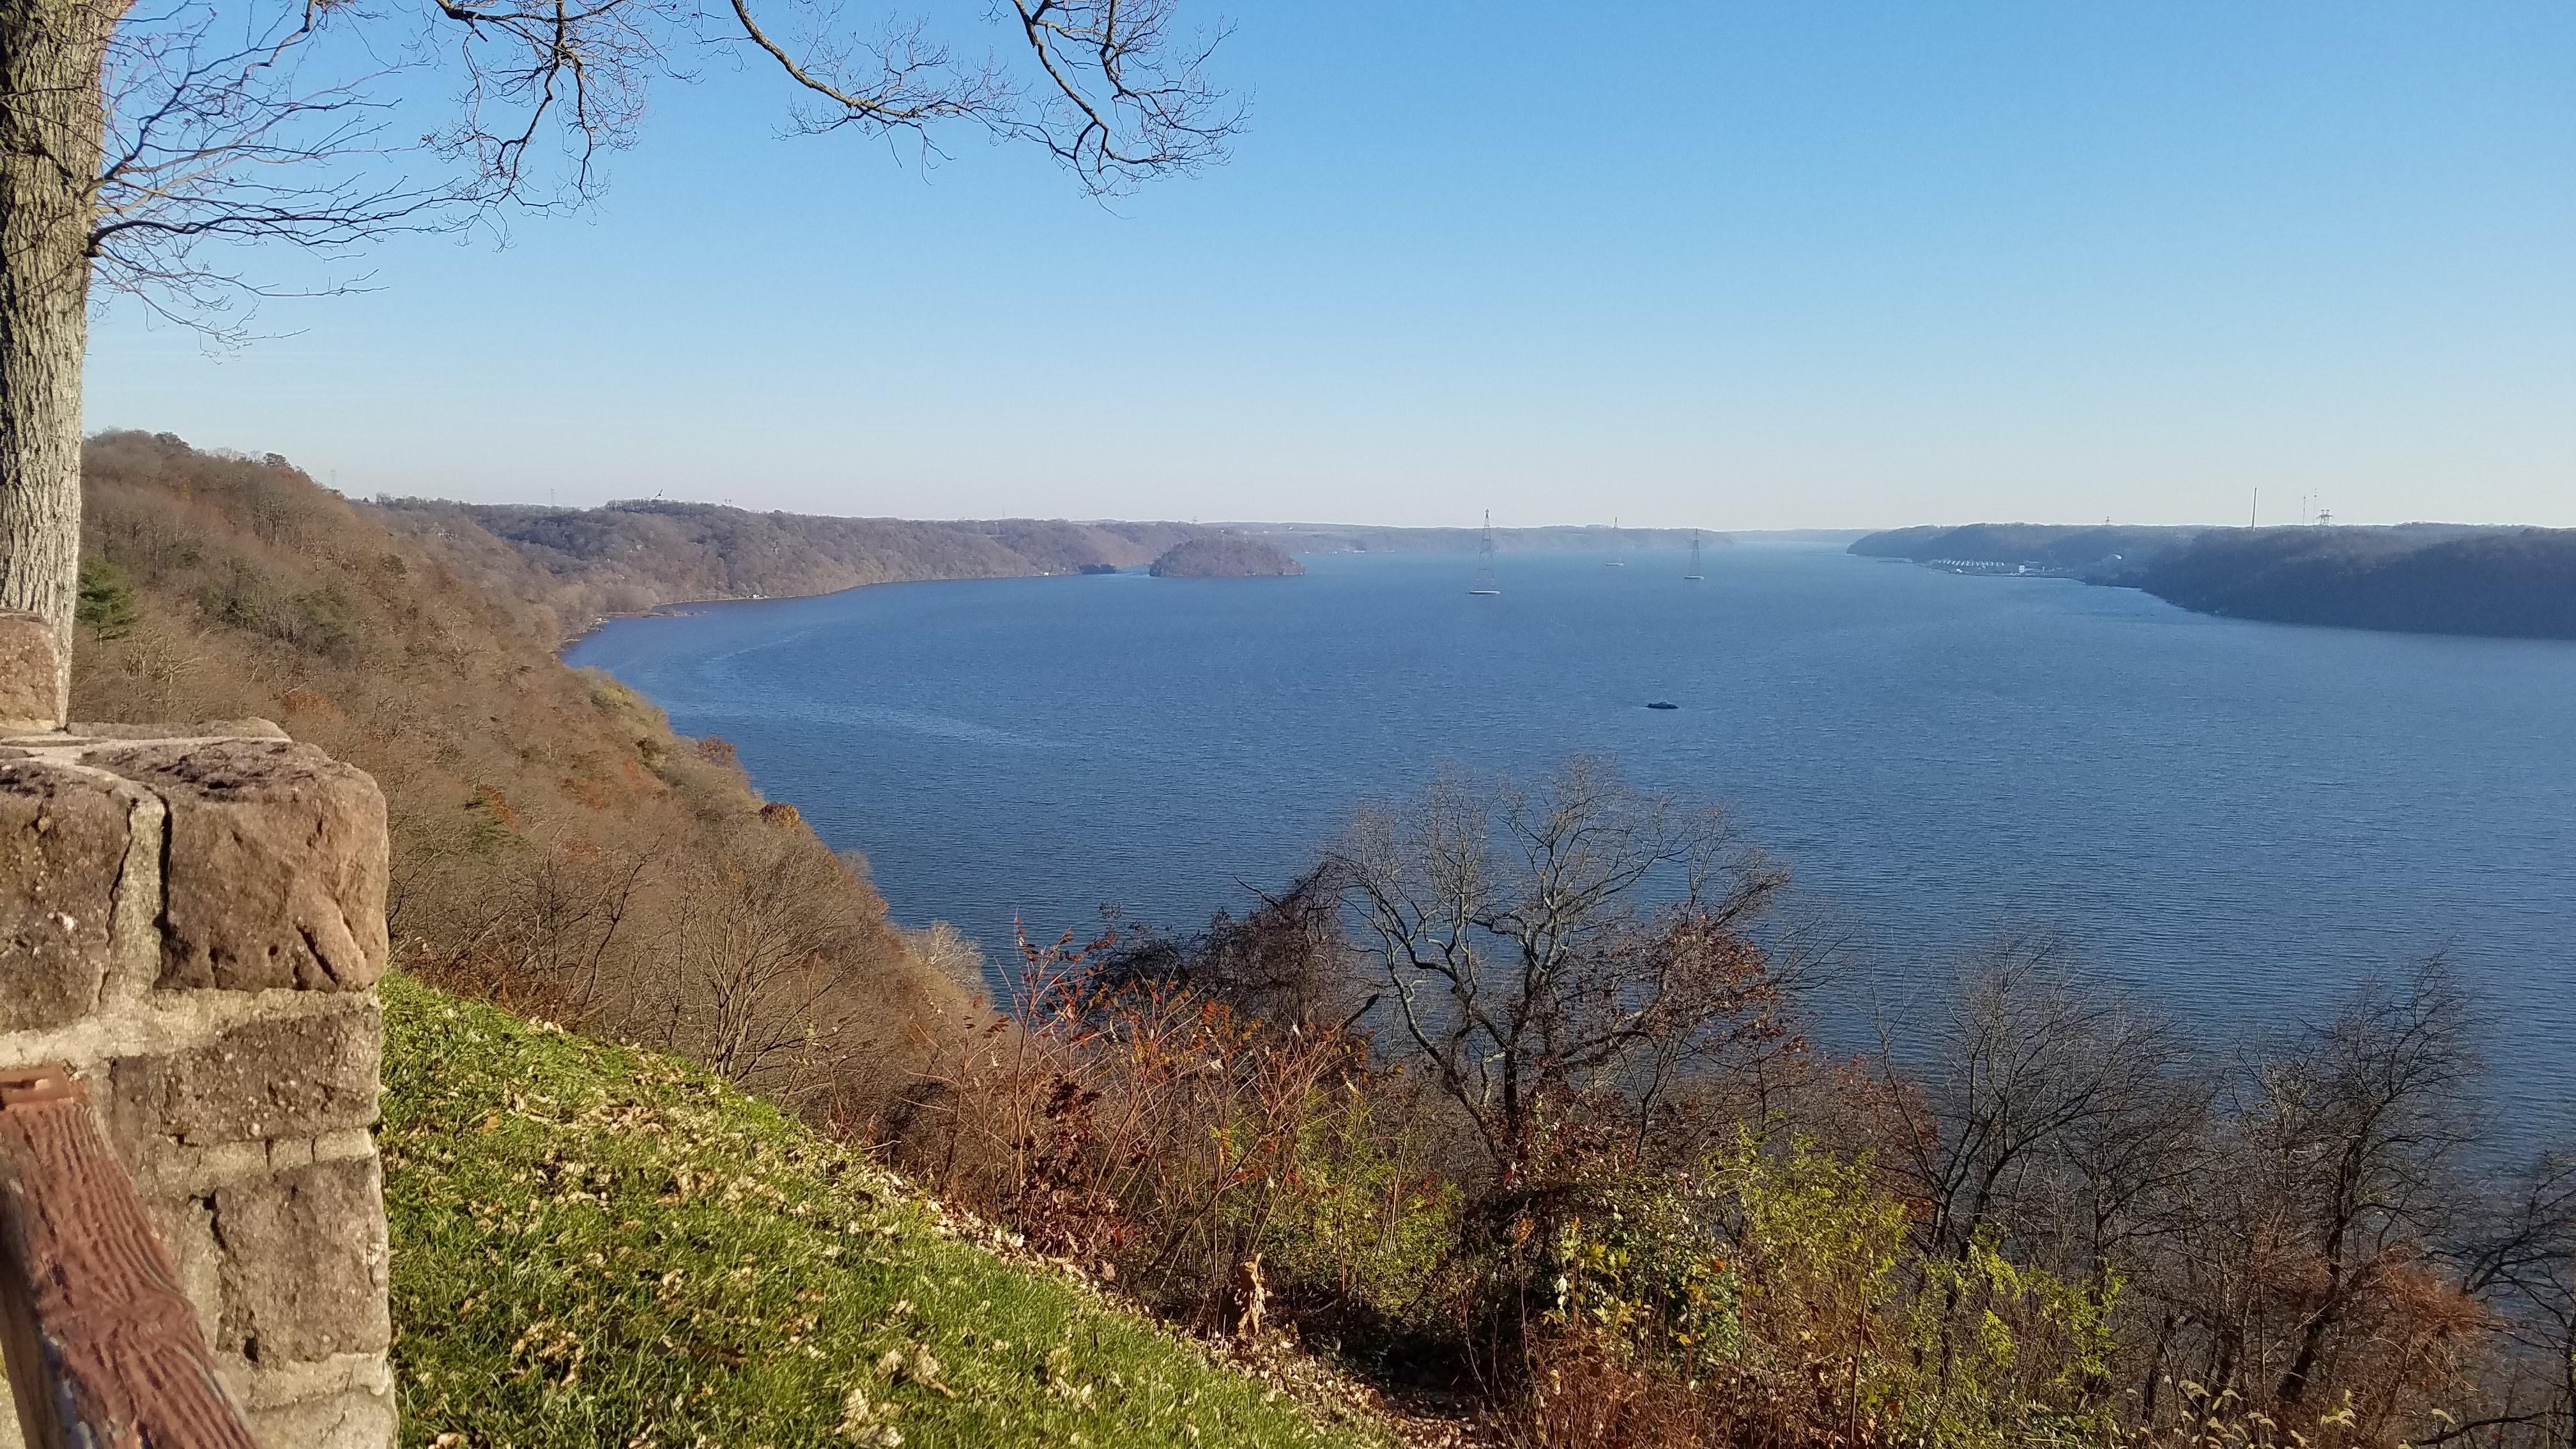 Overlook-Susquehanna-river-trees-grass